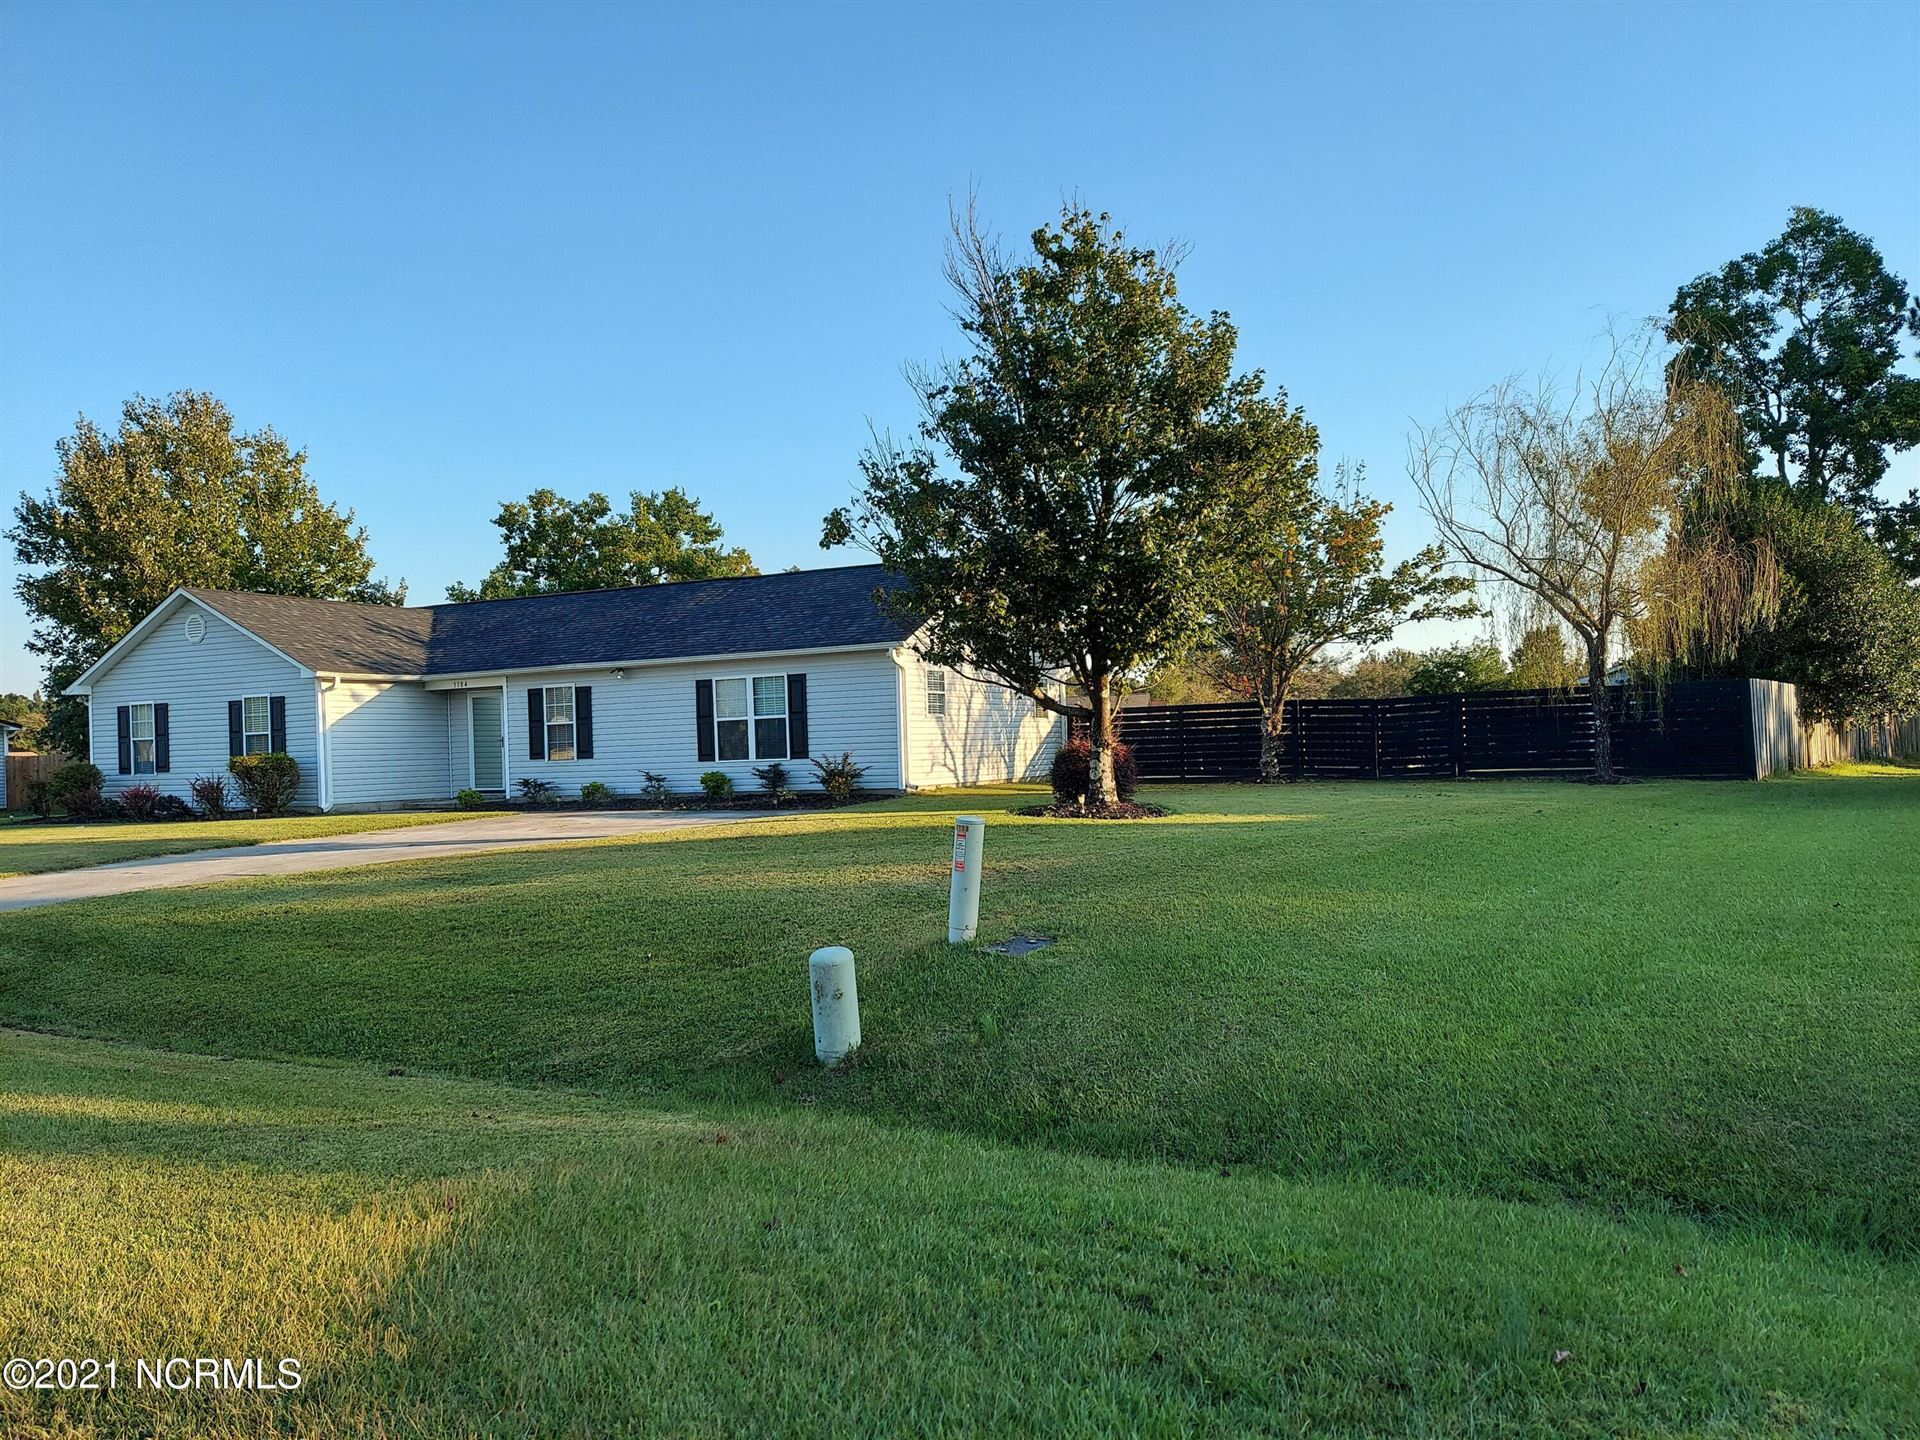 Photo of 3104 Sunbeam Court, Castle Hayne, NC 28429 (MLS # 100295736)